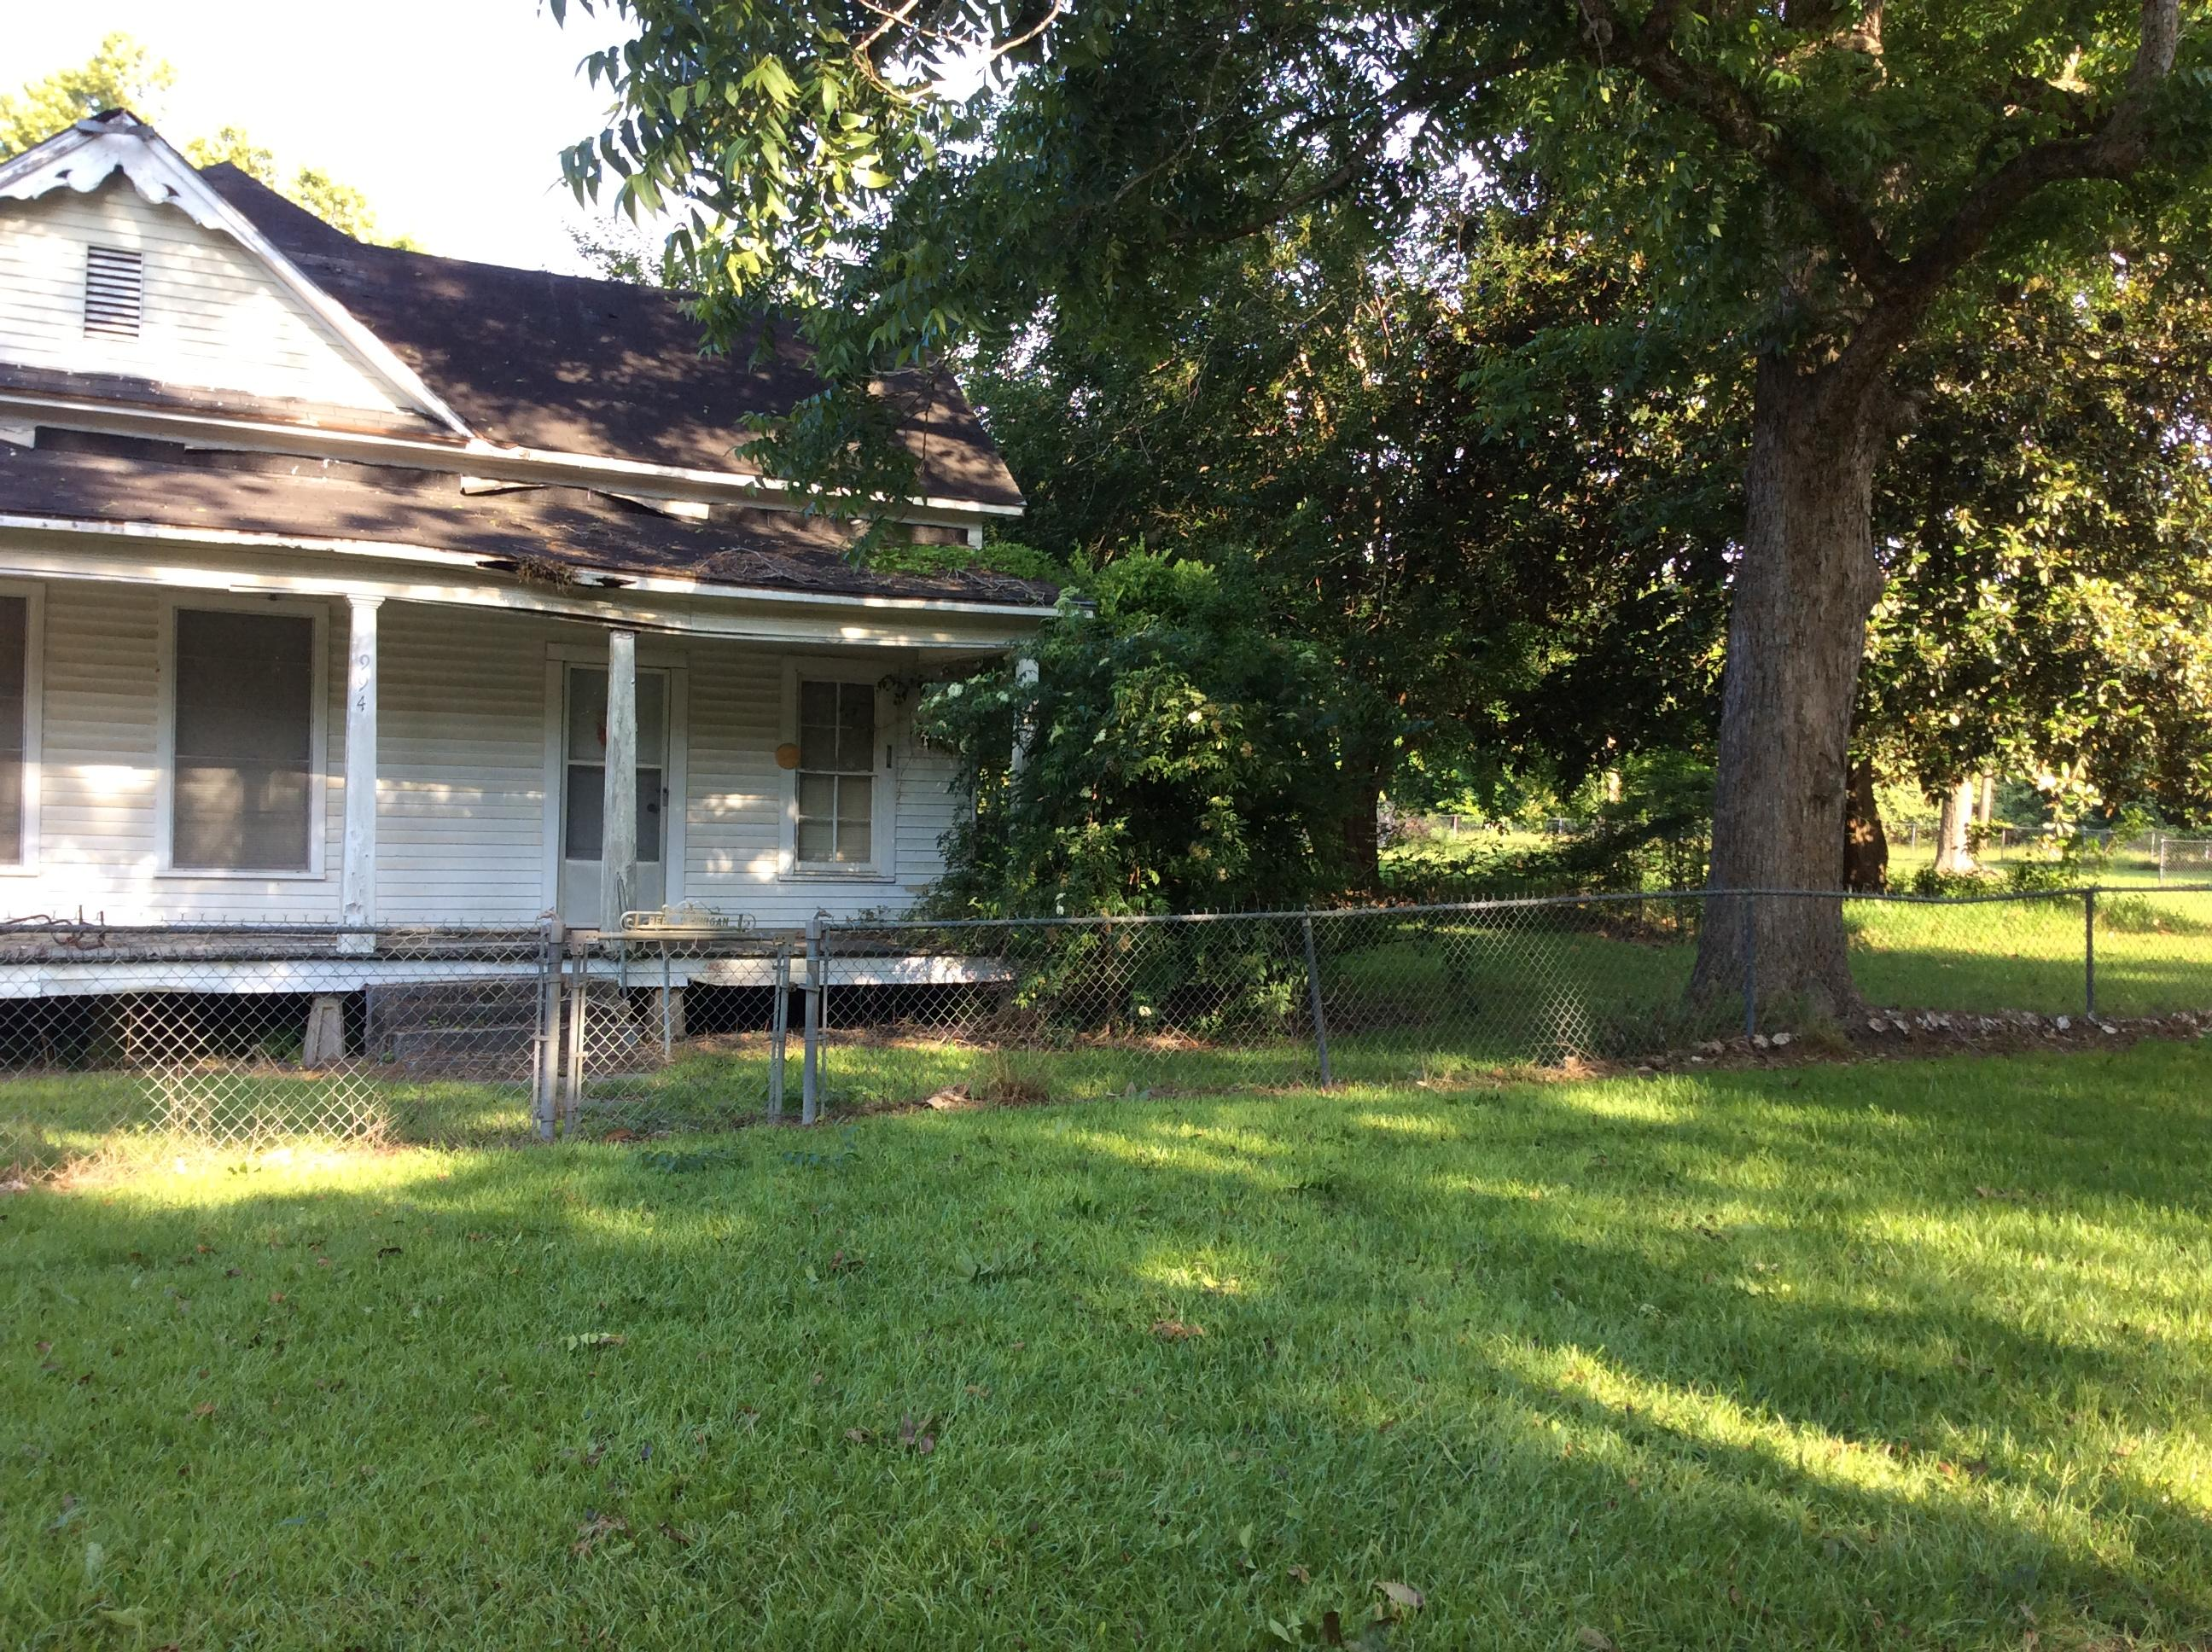 Merryville home for sale, 994 1ST AVE, Merryville LA - $32,000